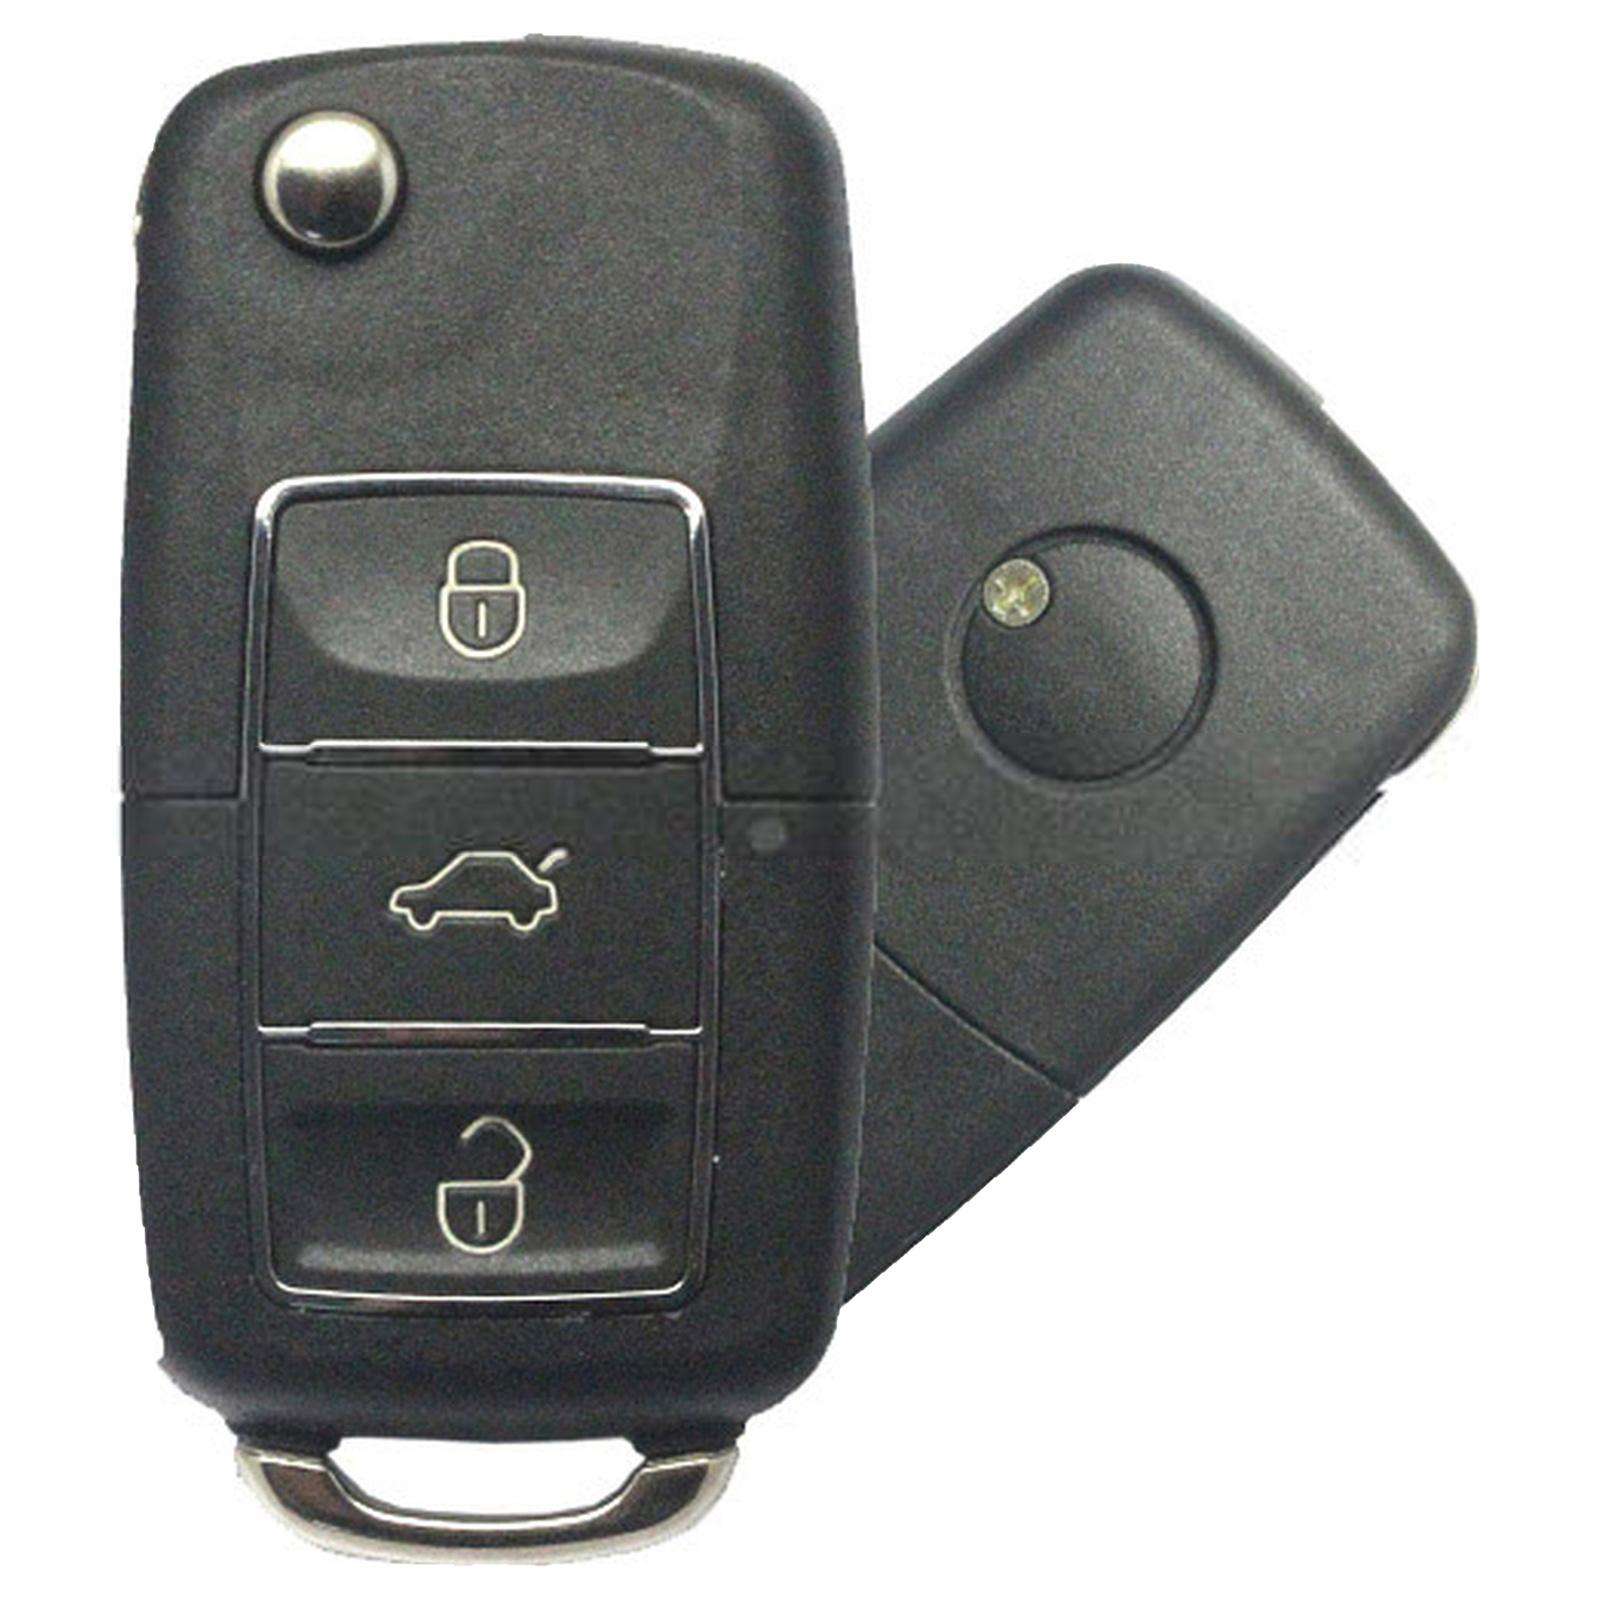 KYDZ Volkswagen B5 Type Remote Key 3 Brard - Pack of 5